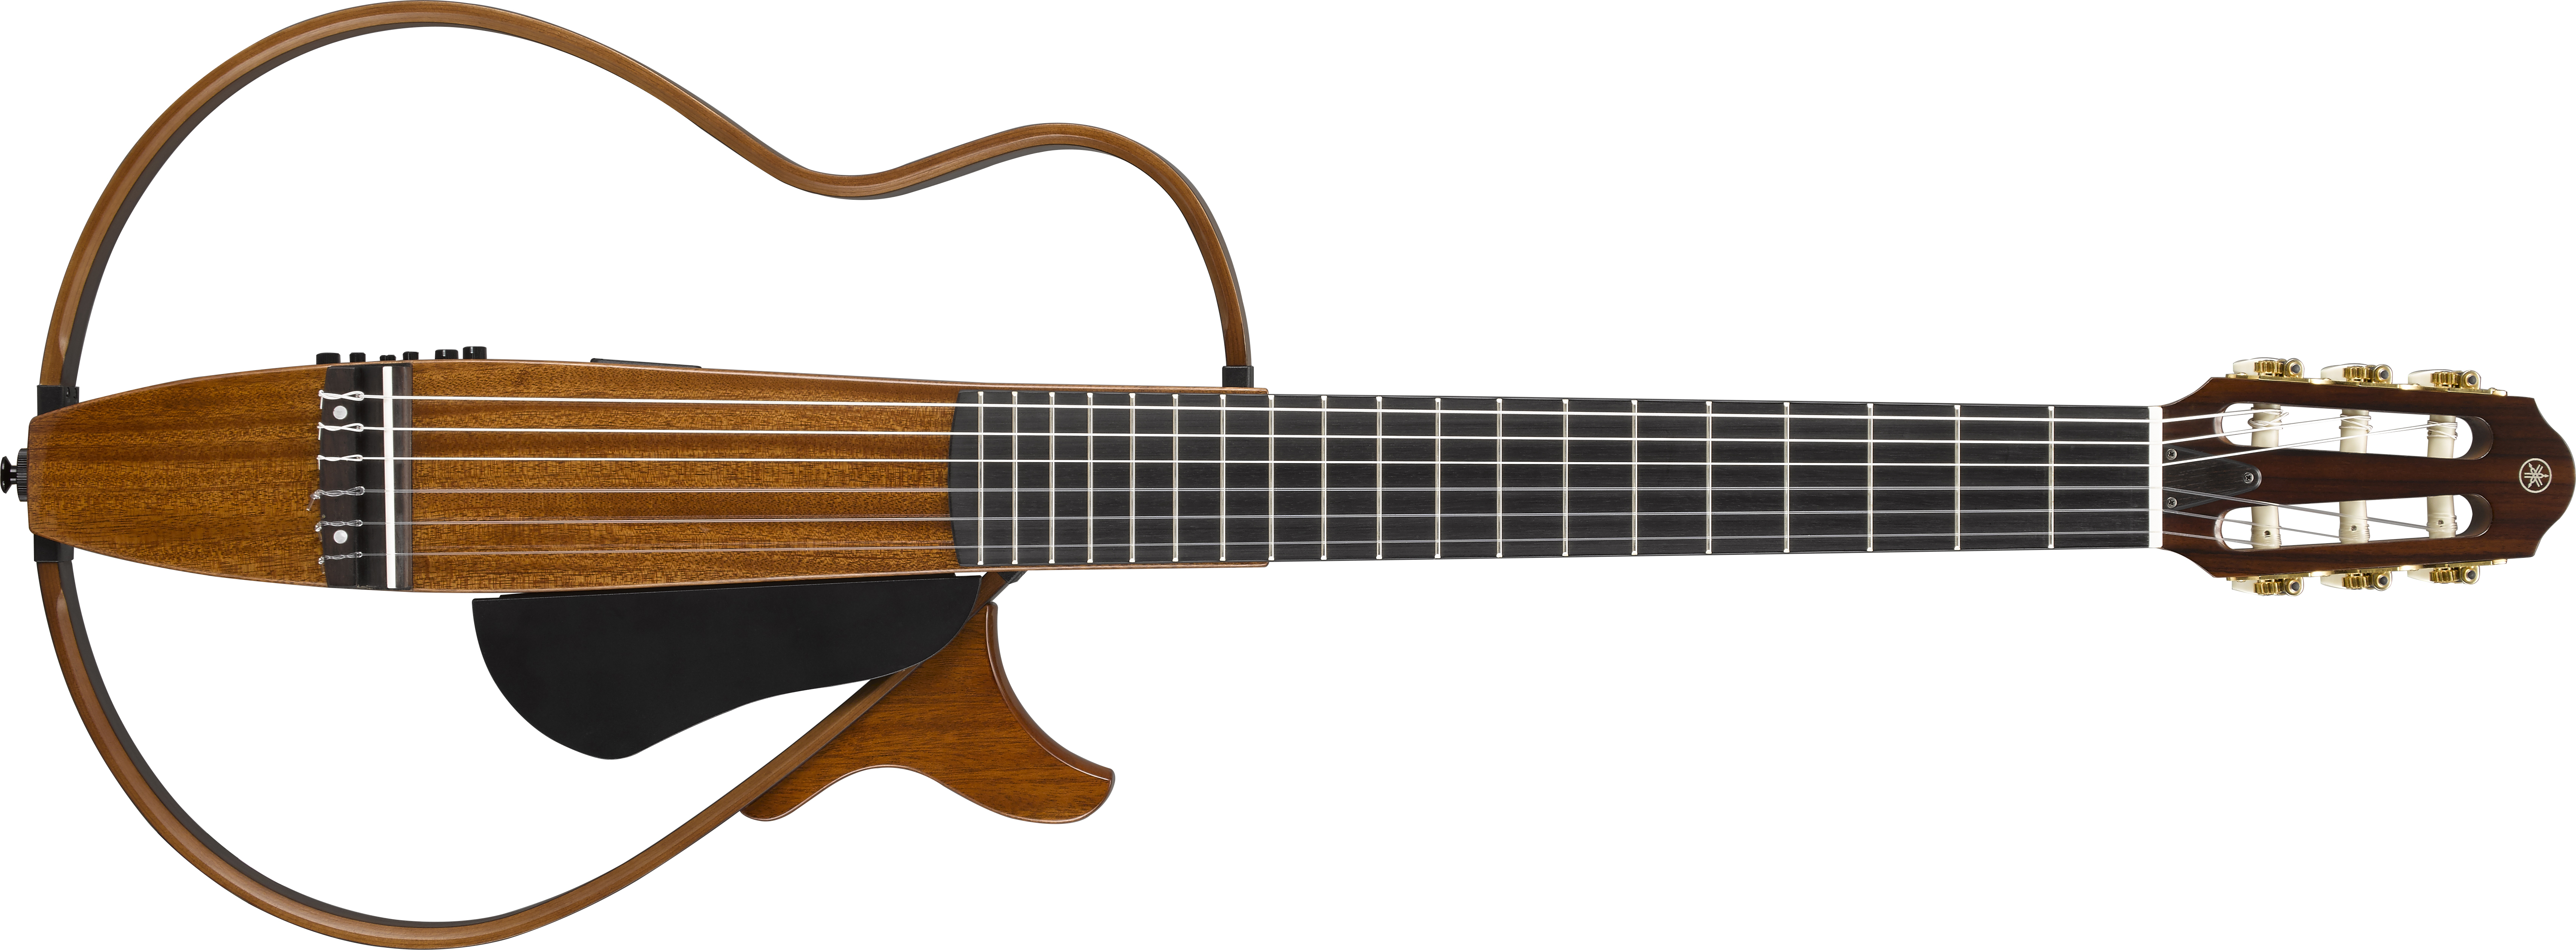 Vintage Yamaha Acoustic Guitar Models